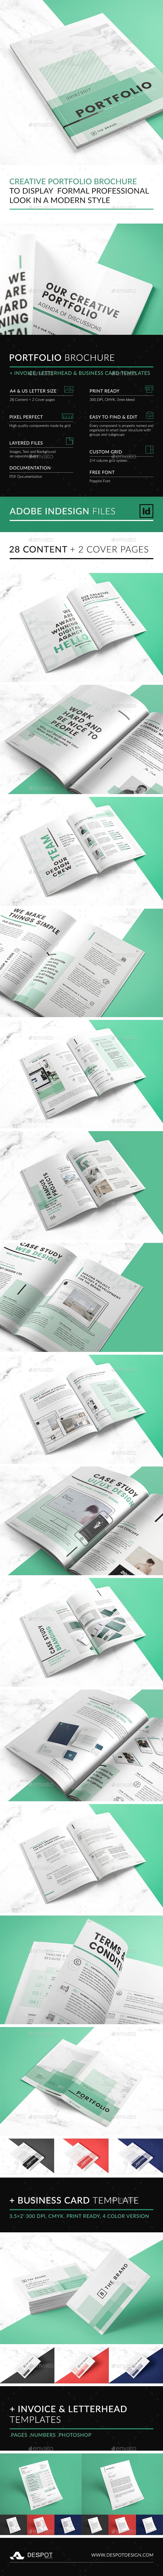 The Brand Portfolio - Portfolio Brochures